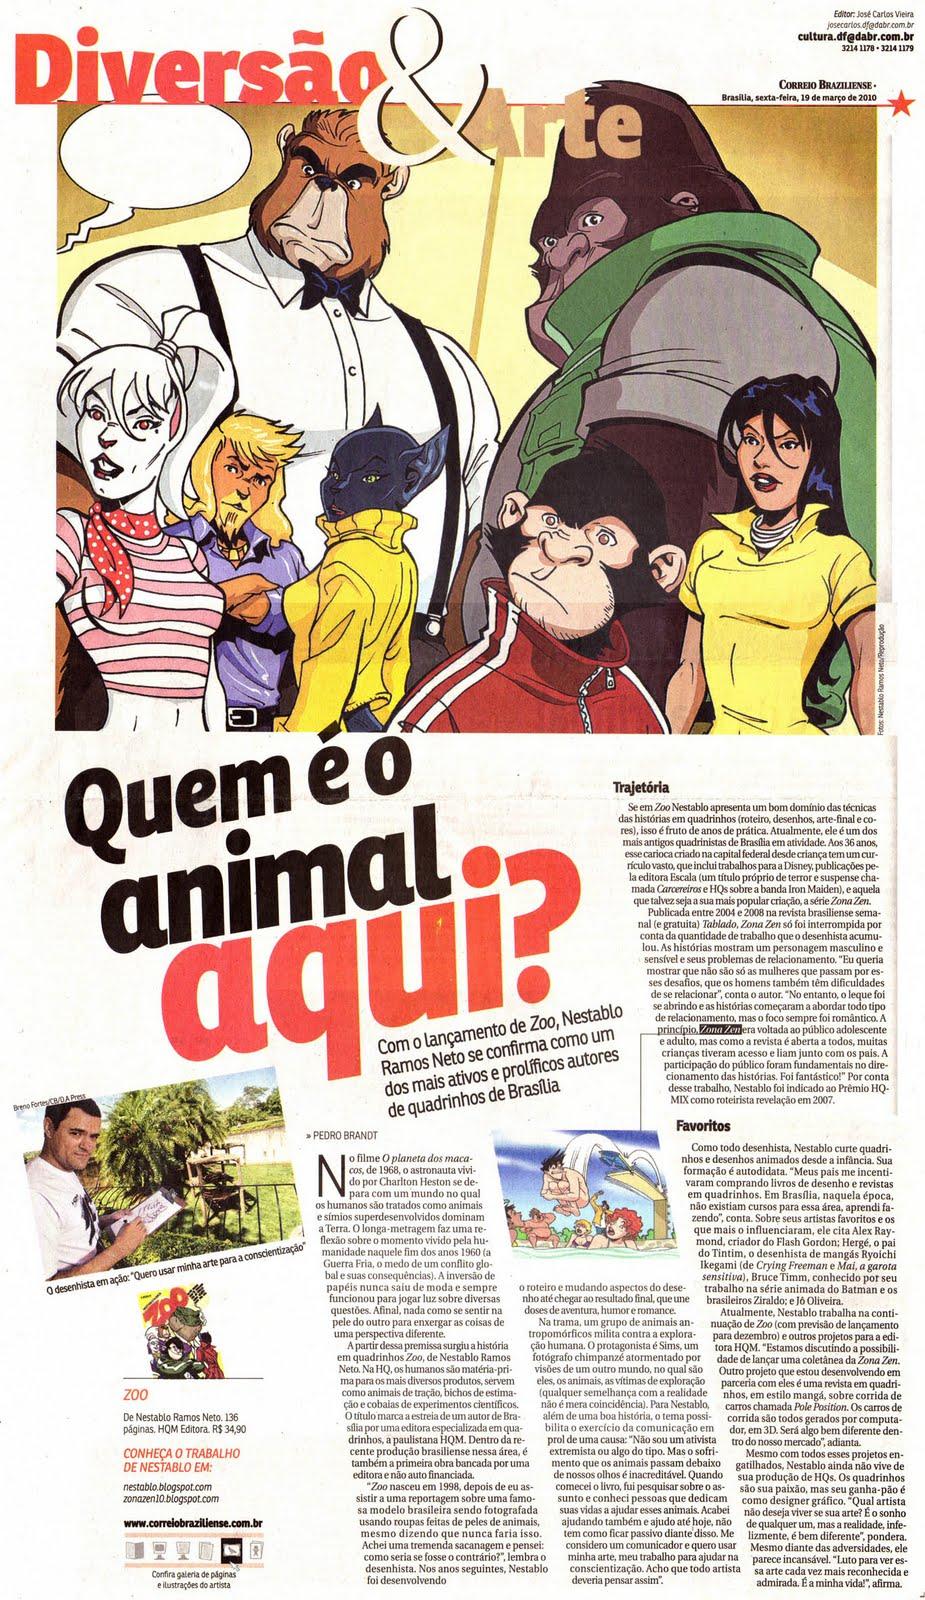 [CORREIO+BRAZILIENSE02+copy.jpg]